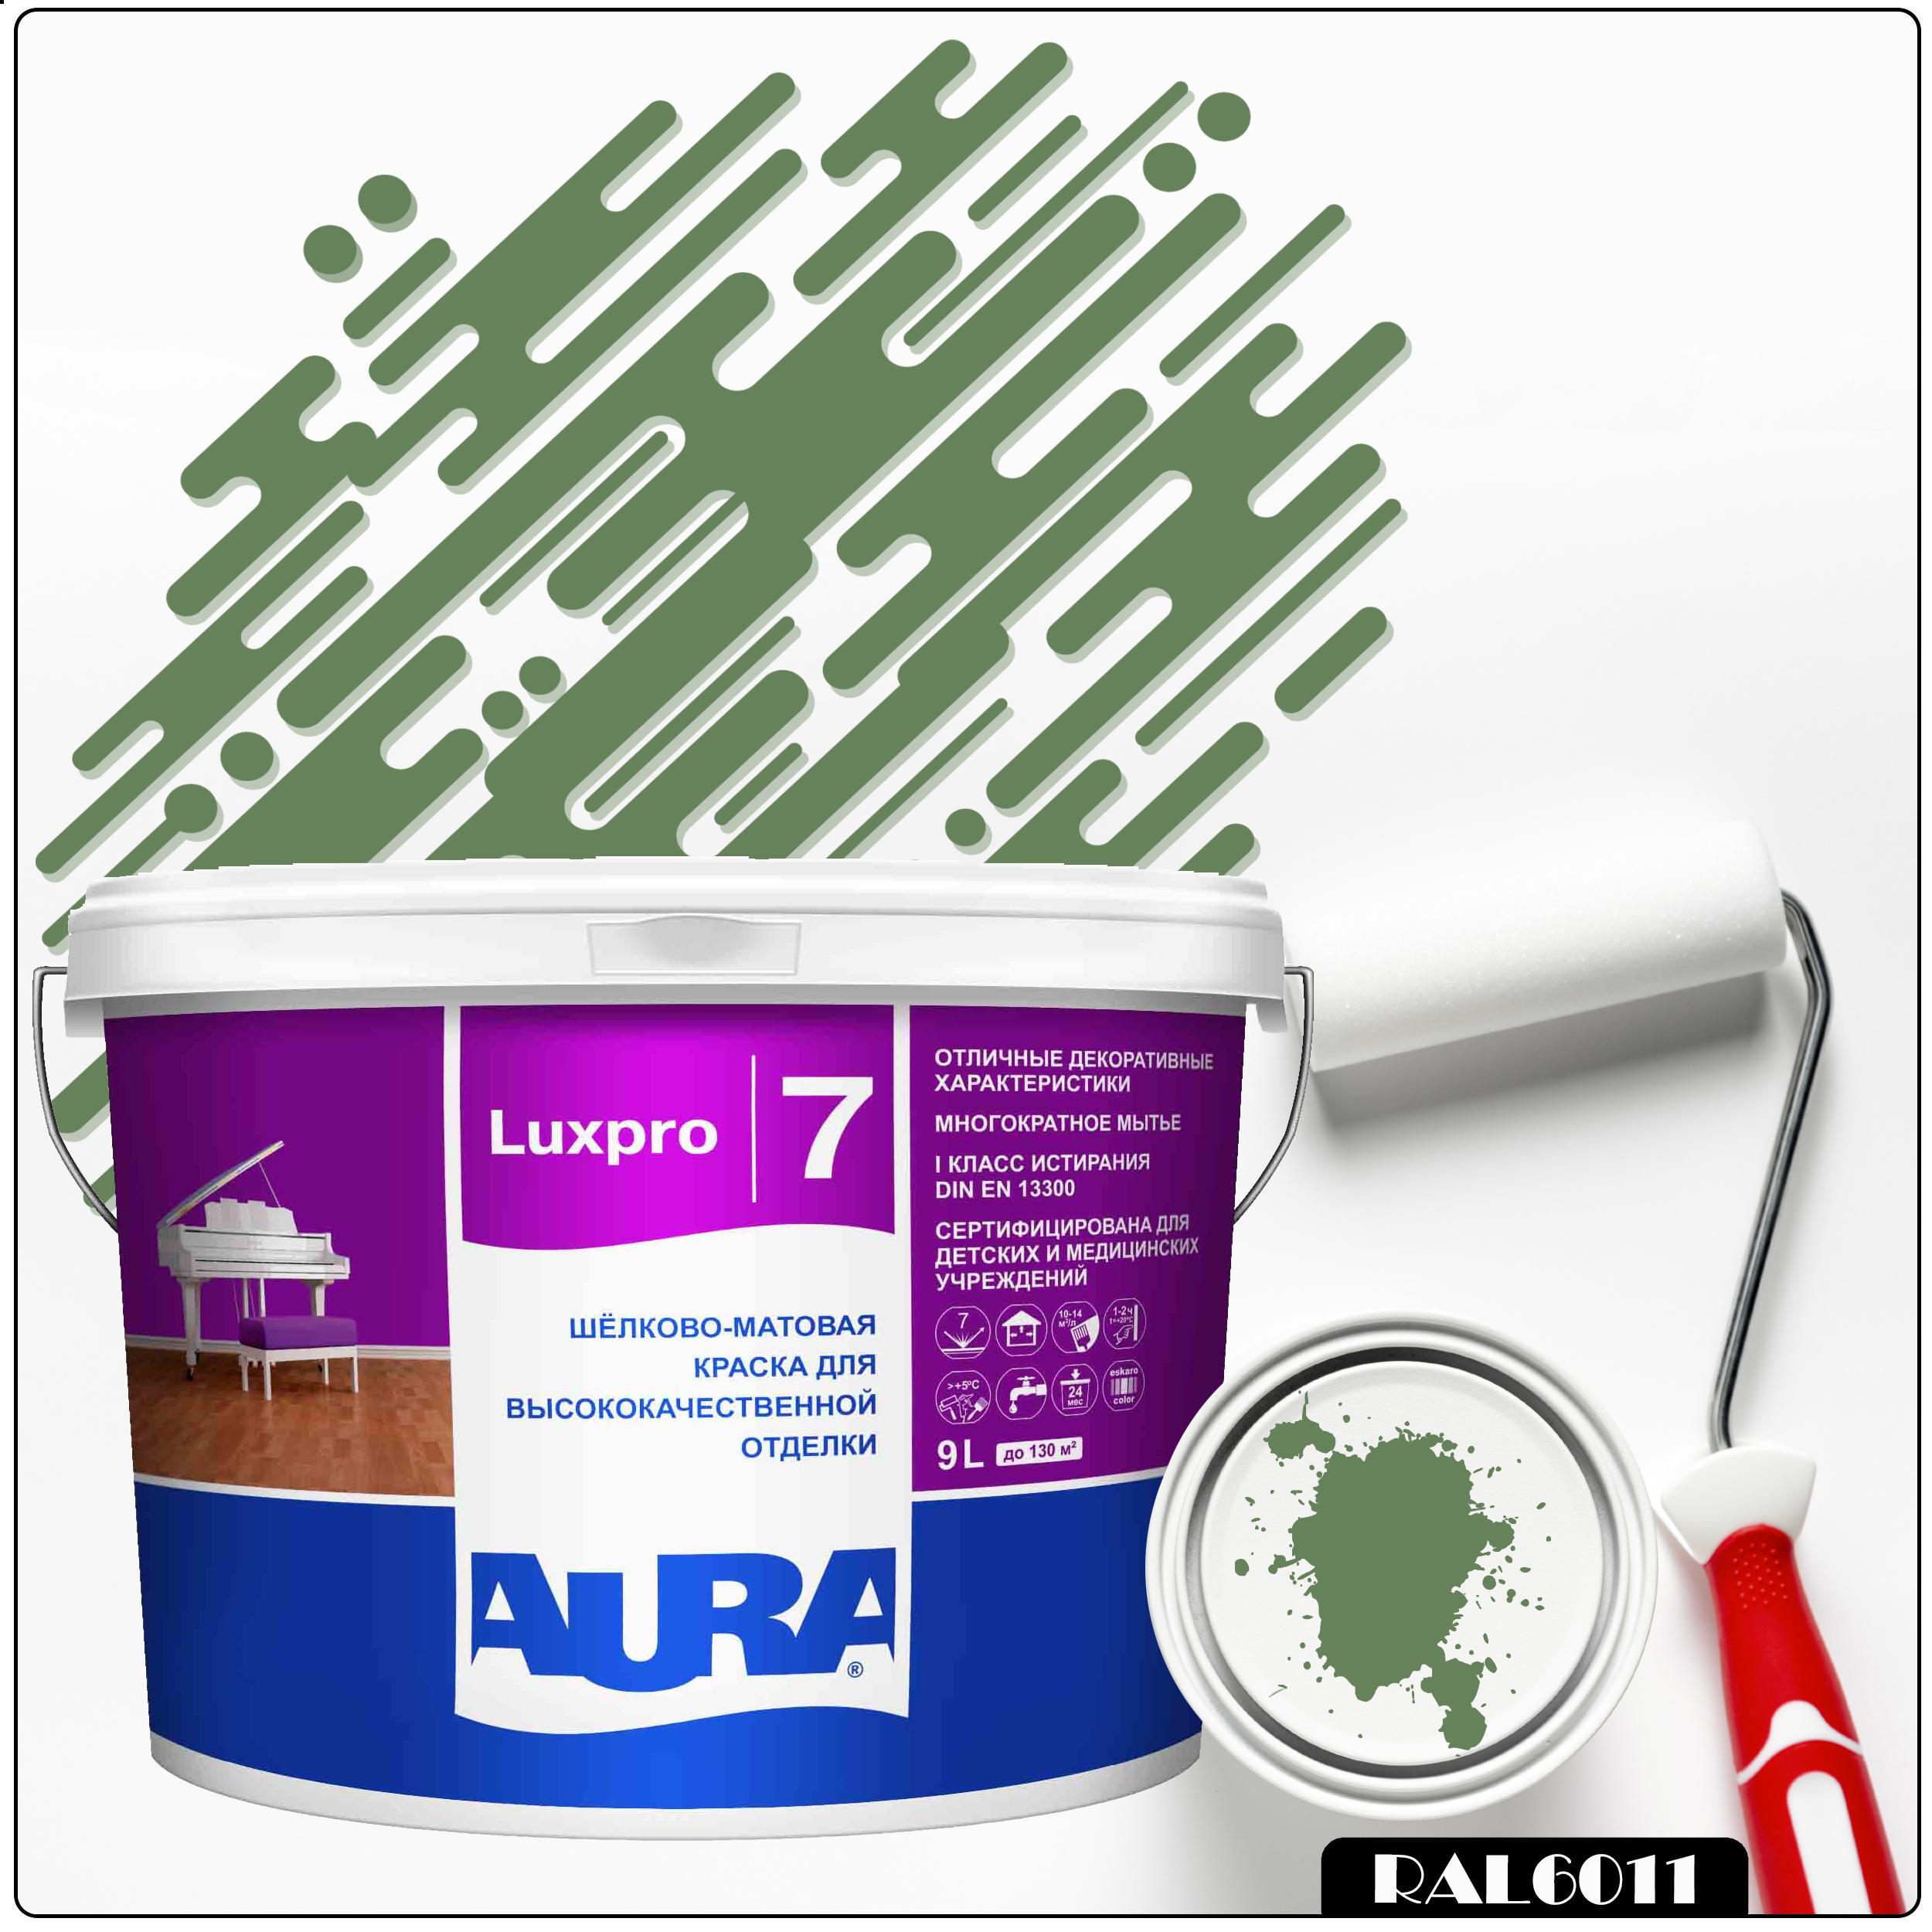 Фото 12 - Краска Aura LuxPRO 7, RAL 6011 Зеленая резеда, латексная, шелково-матовая, интерьерная, 9л, Аура.